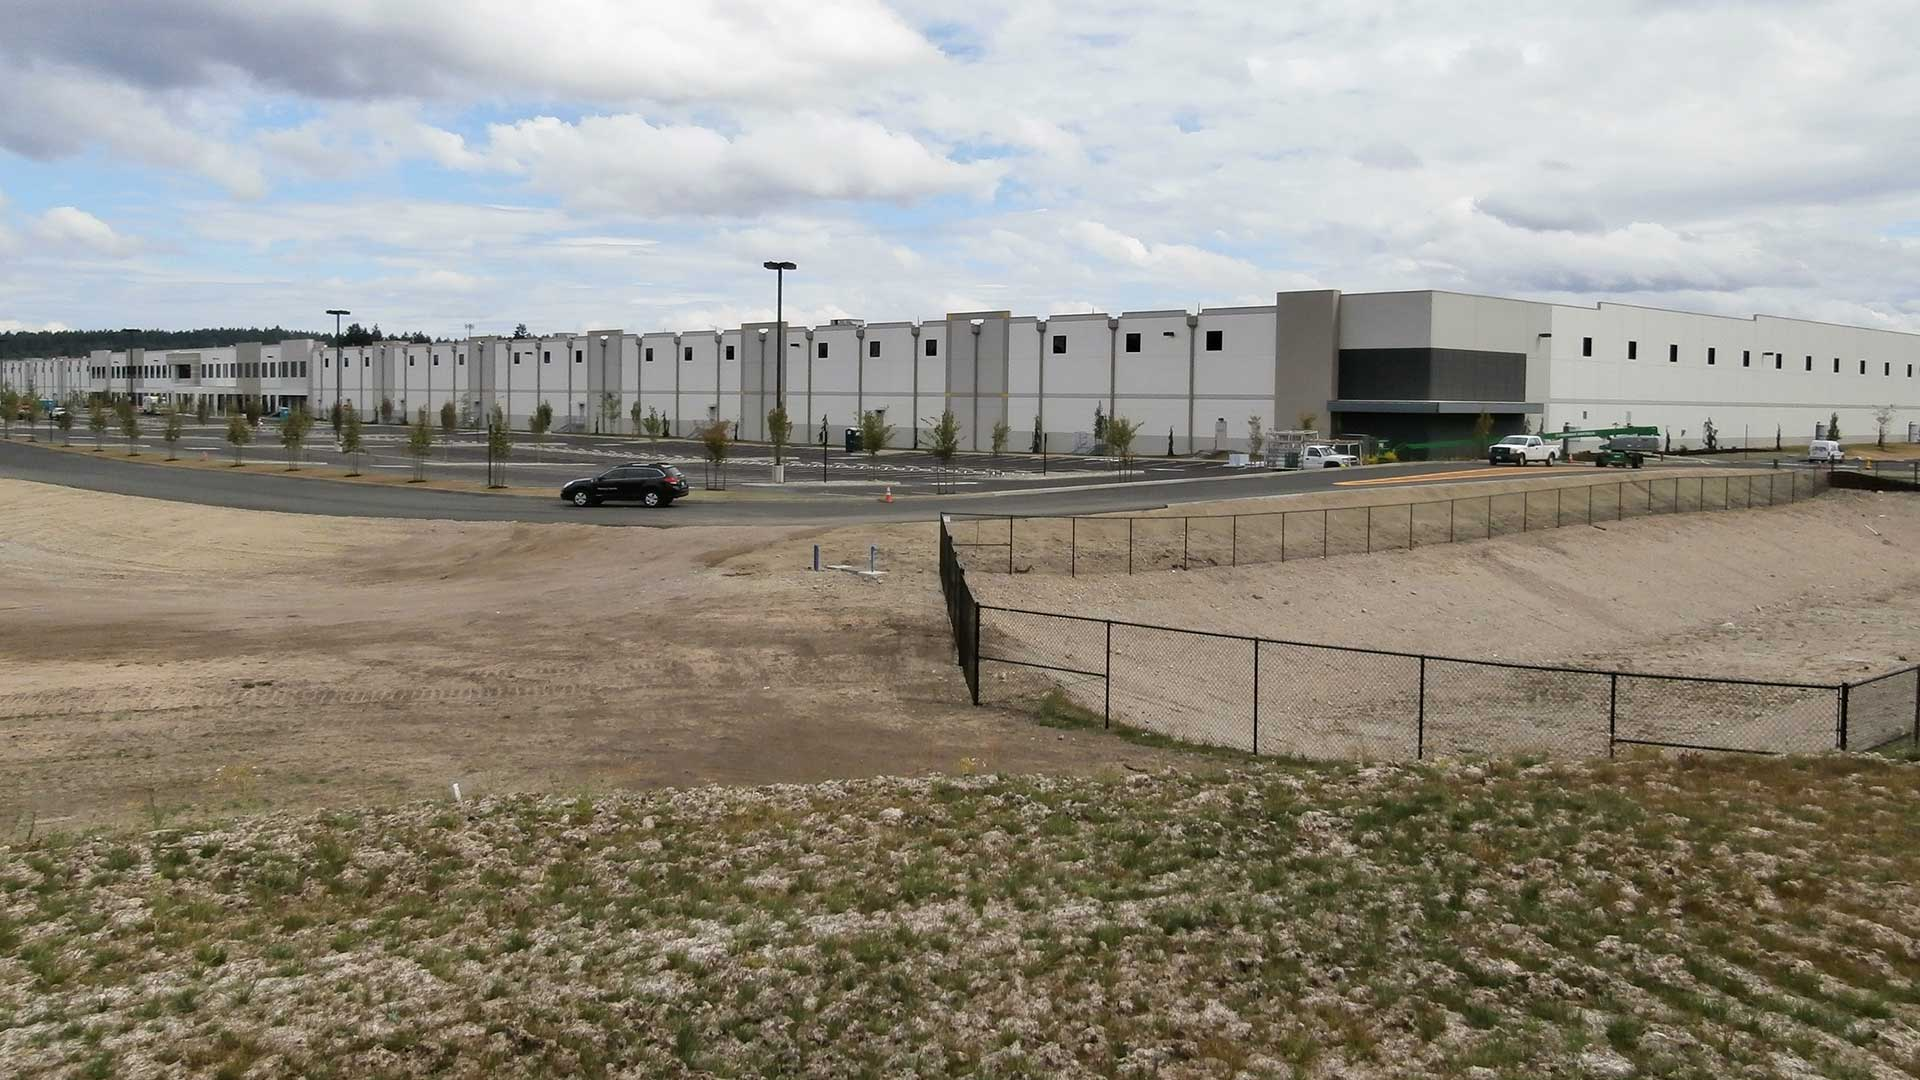 Amazon Distribution Center - building, swale